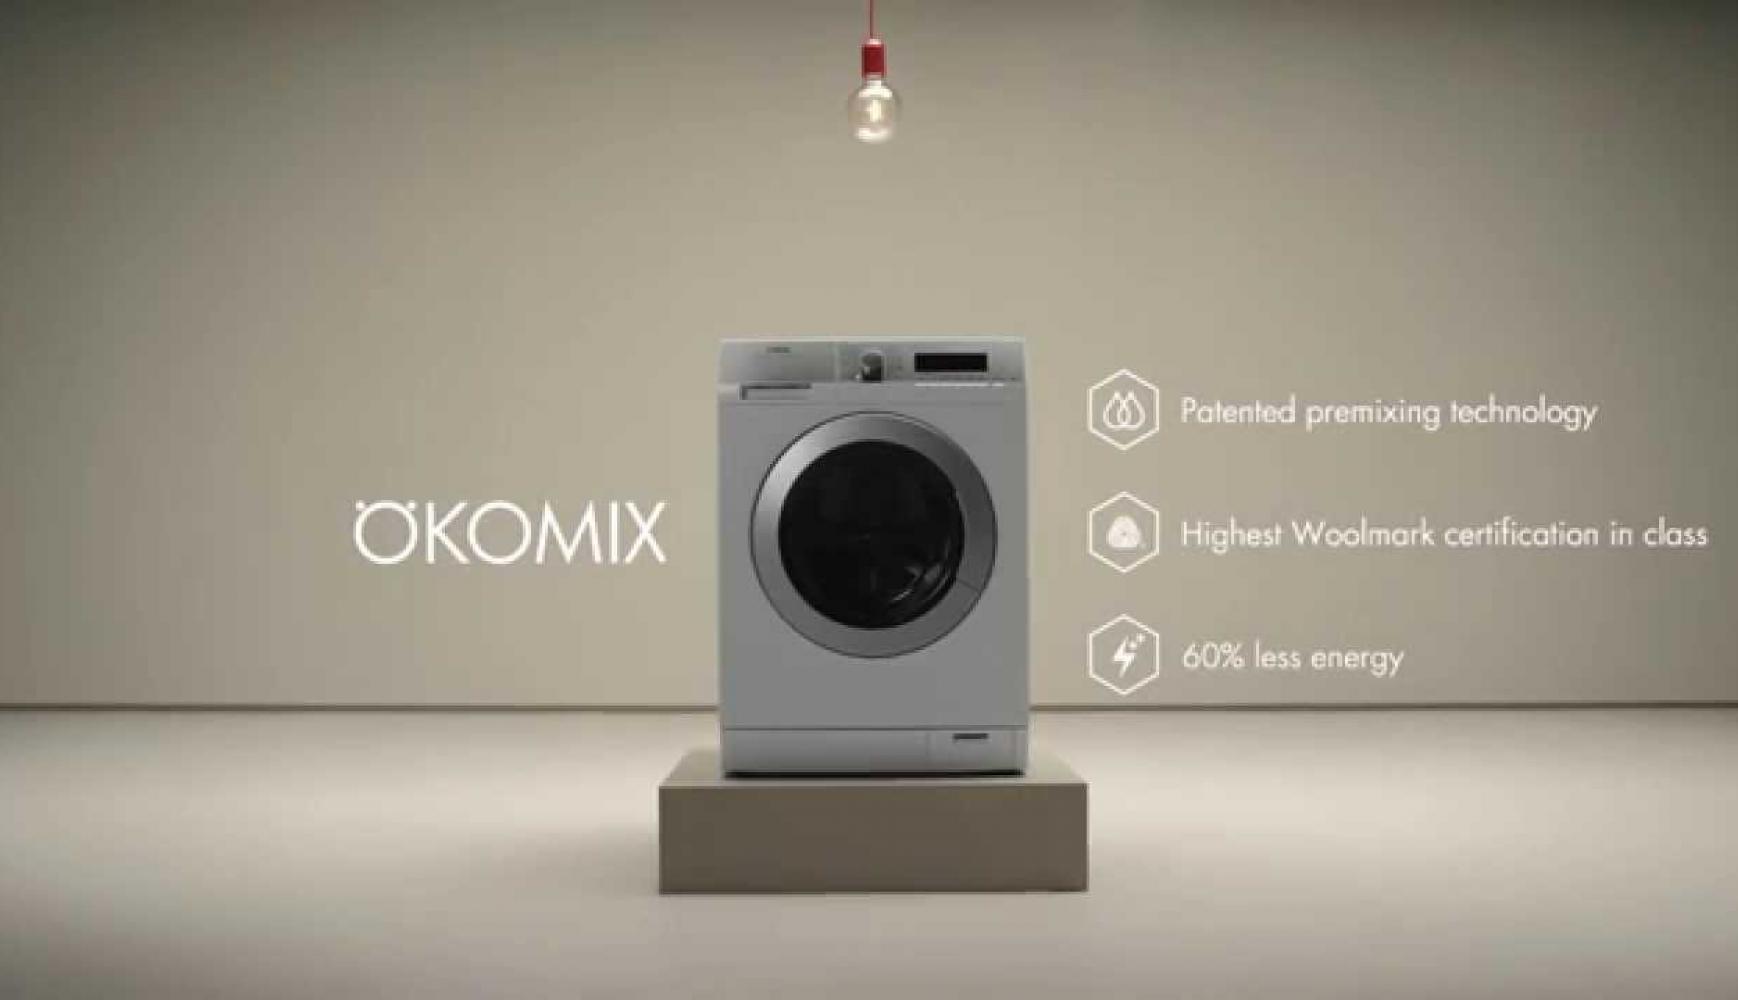 Okomix